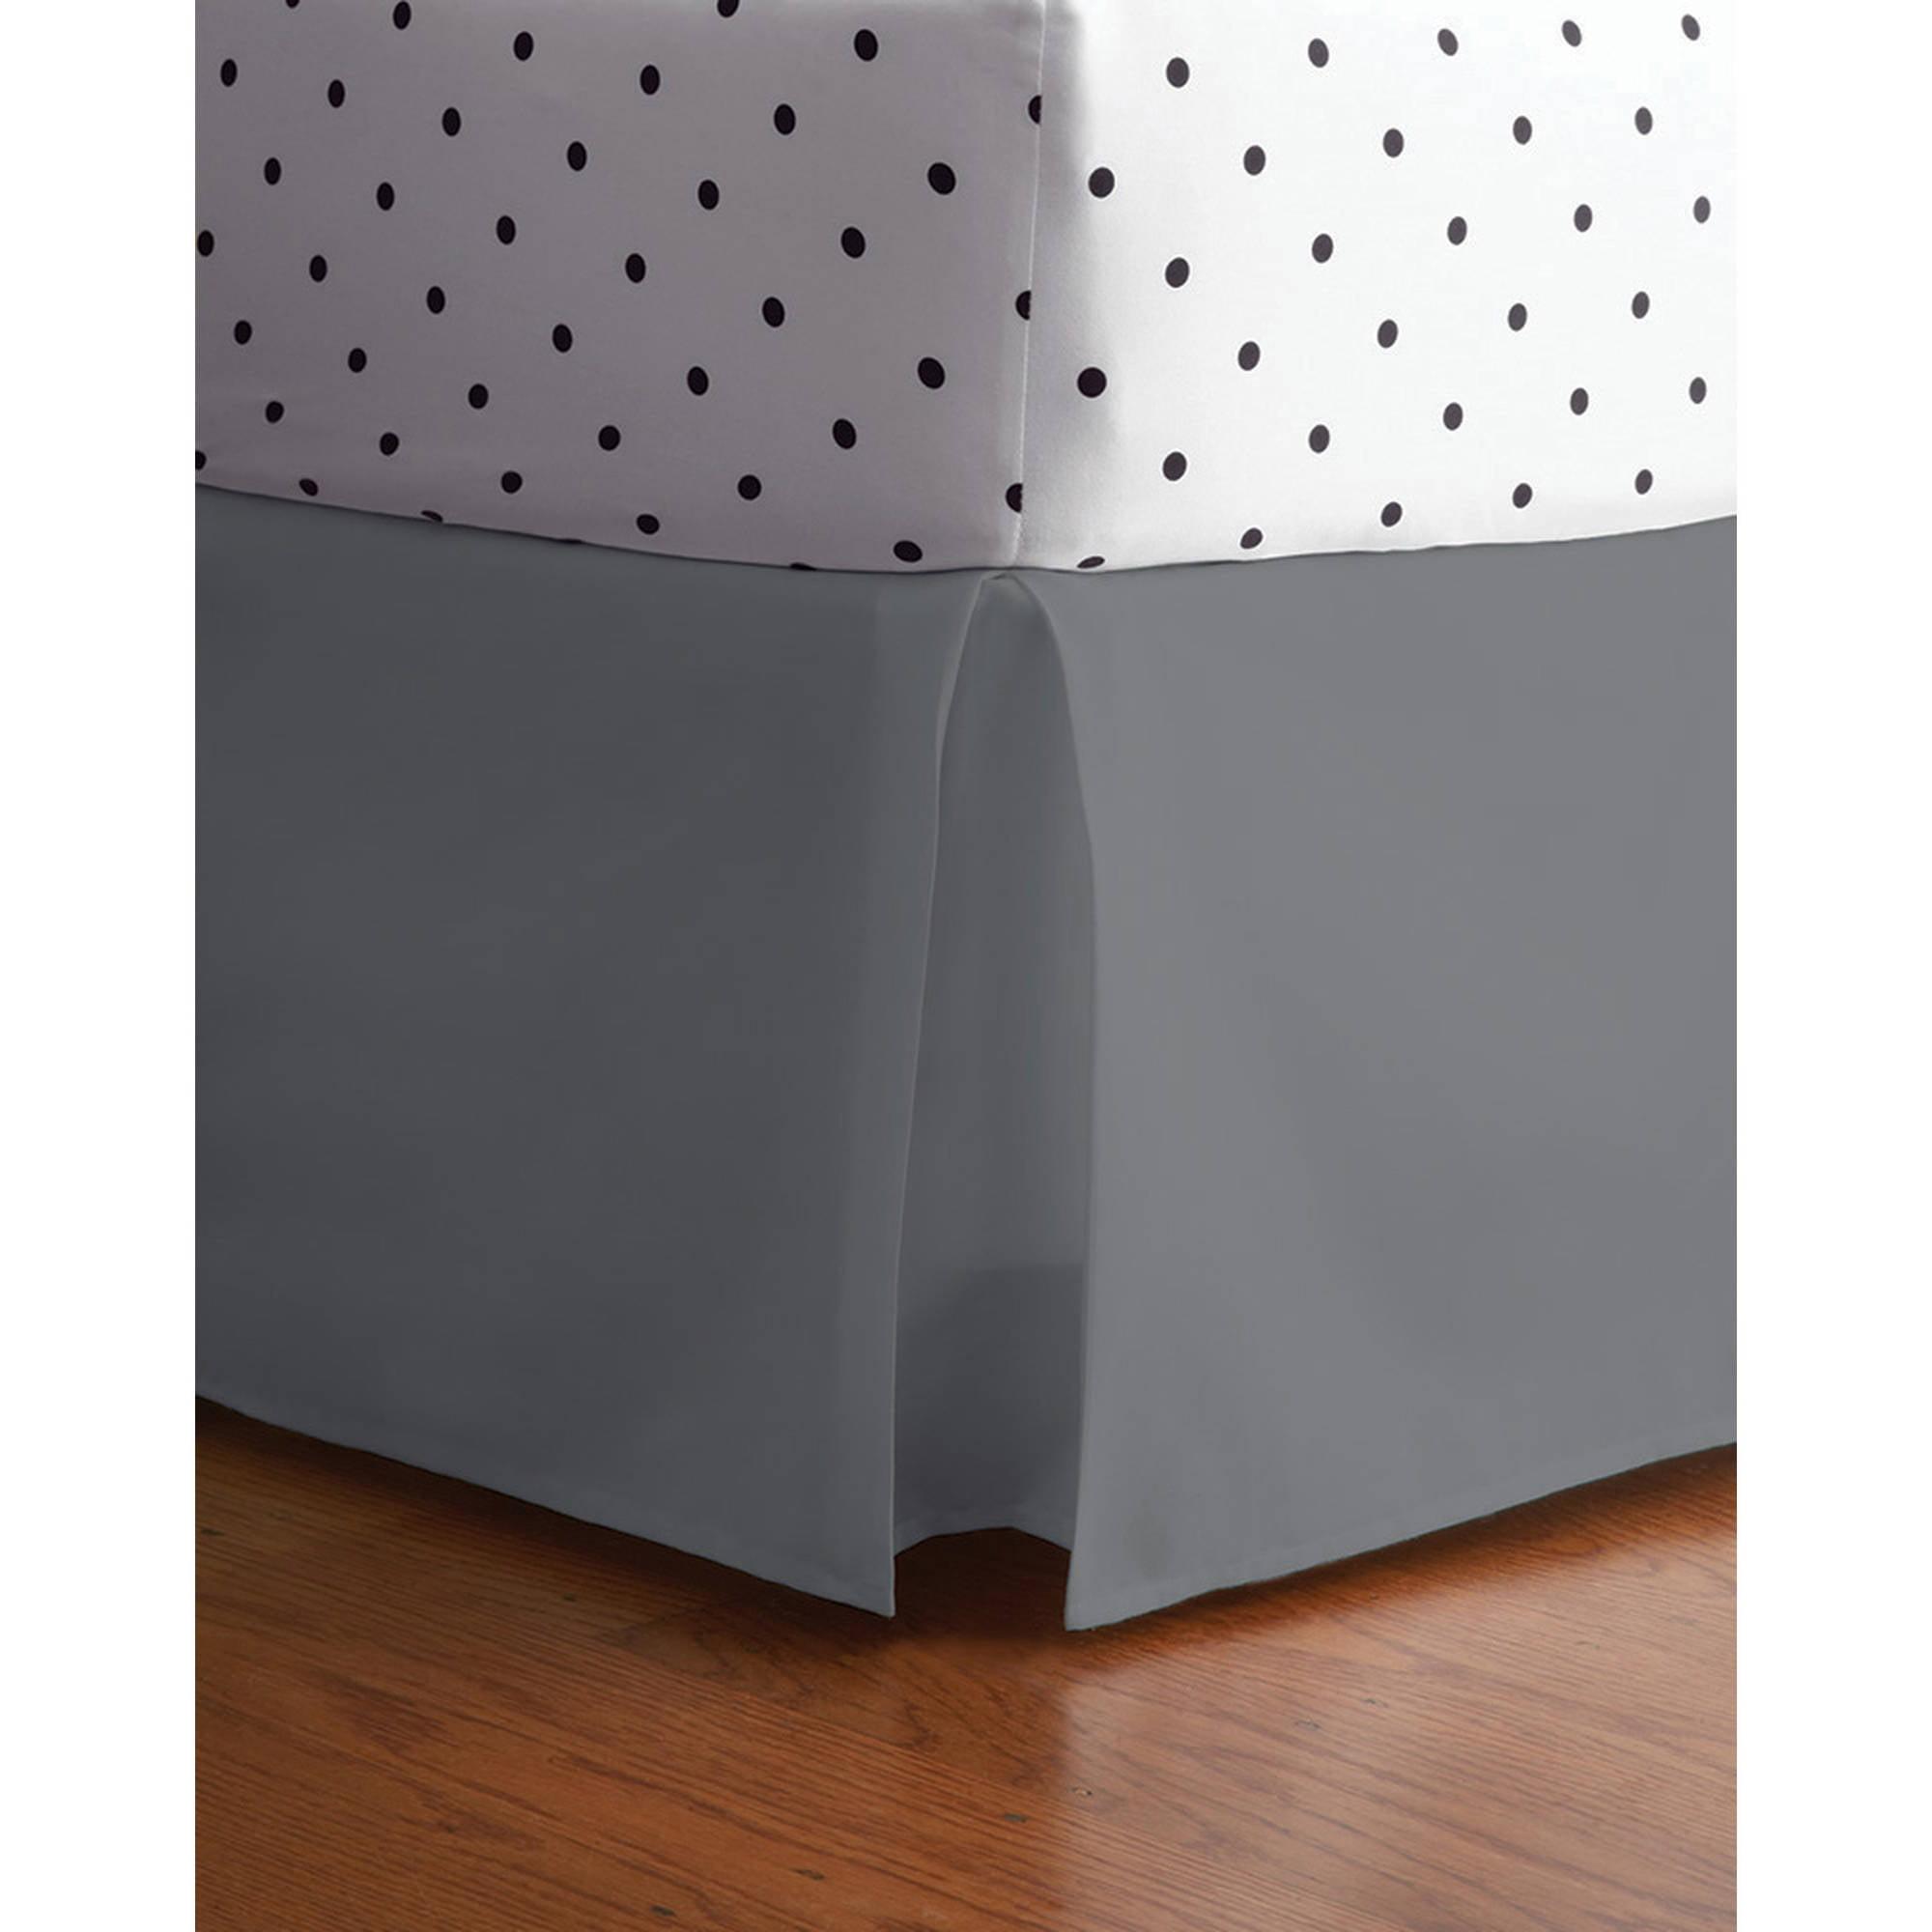 Mainstays Kids Microfiber Solid Bed Skirt, Full